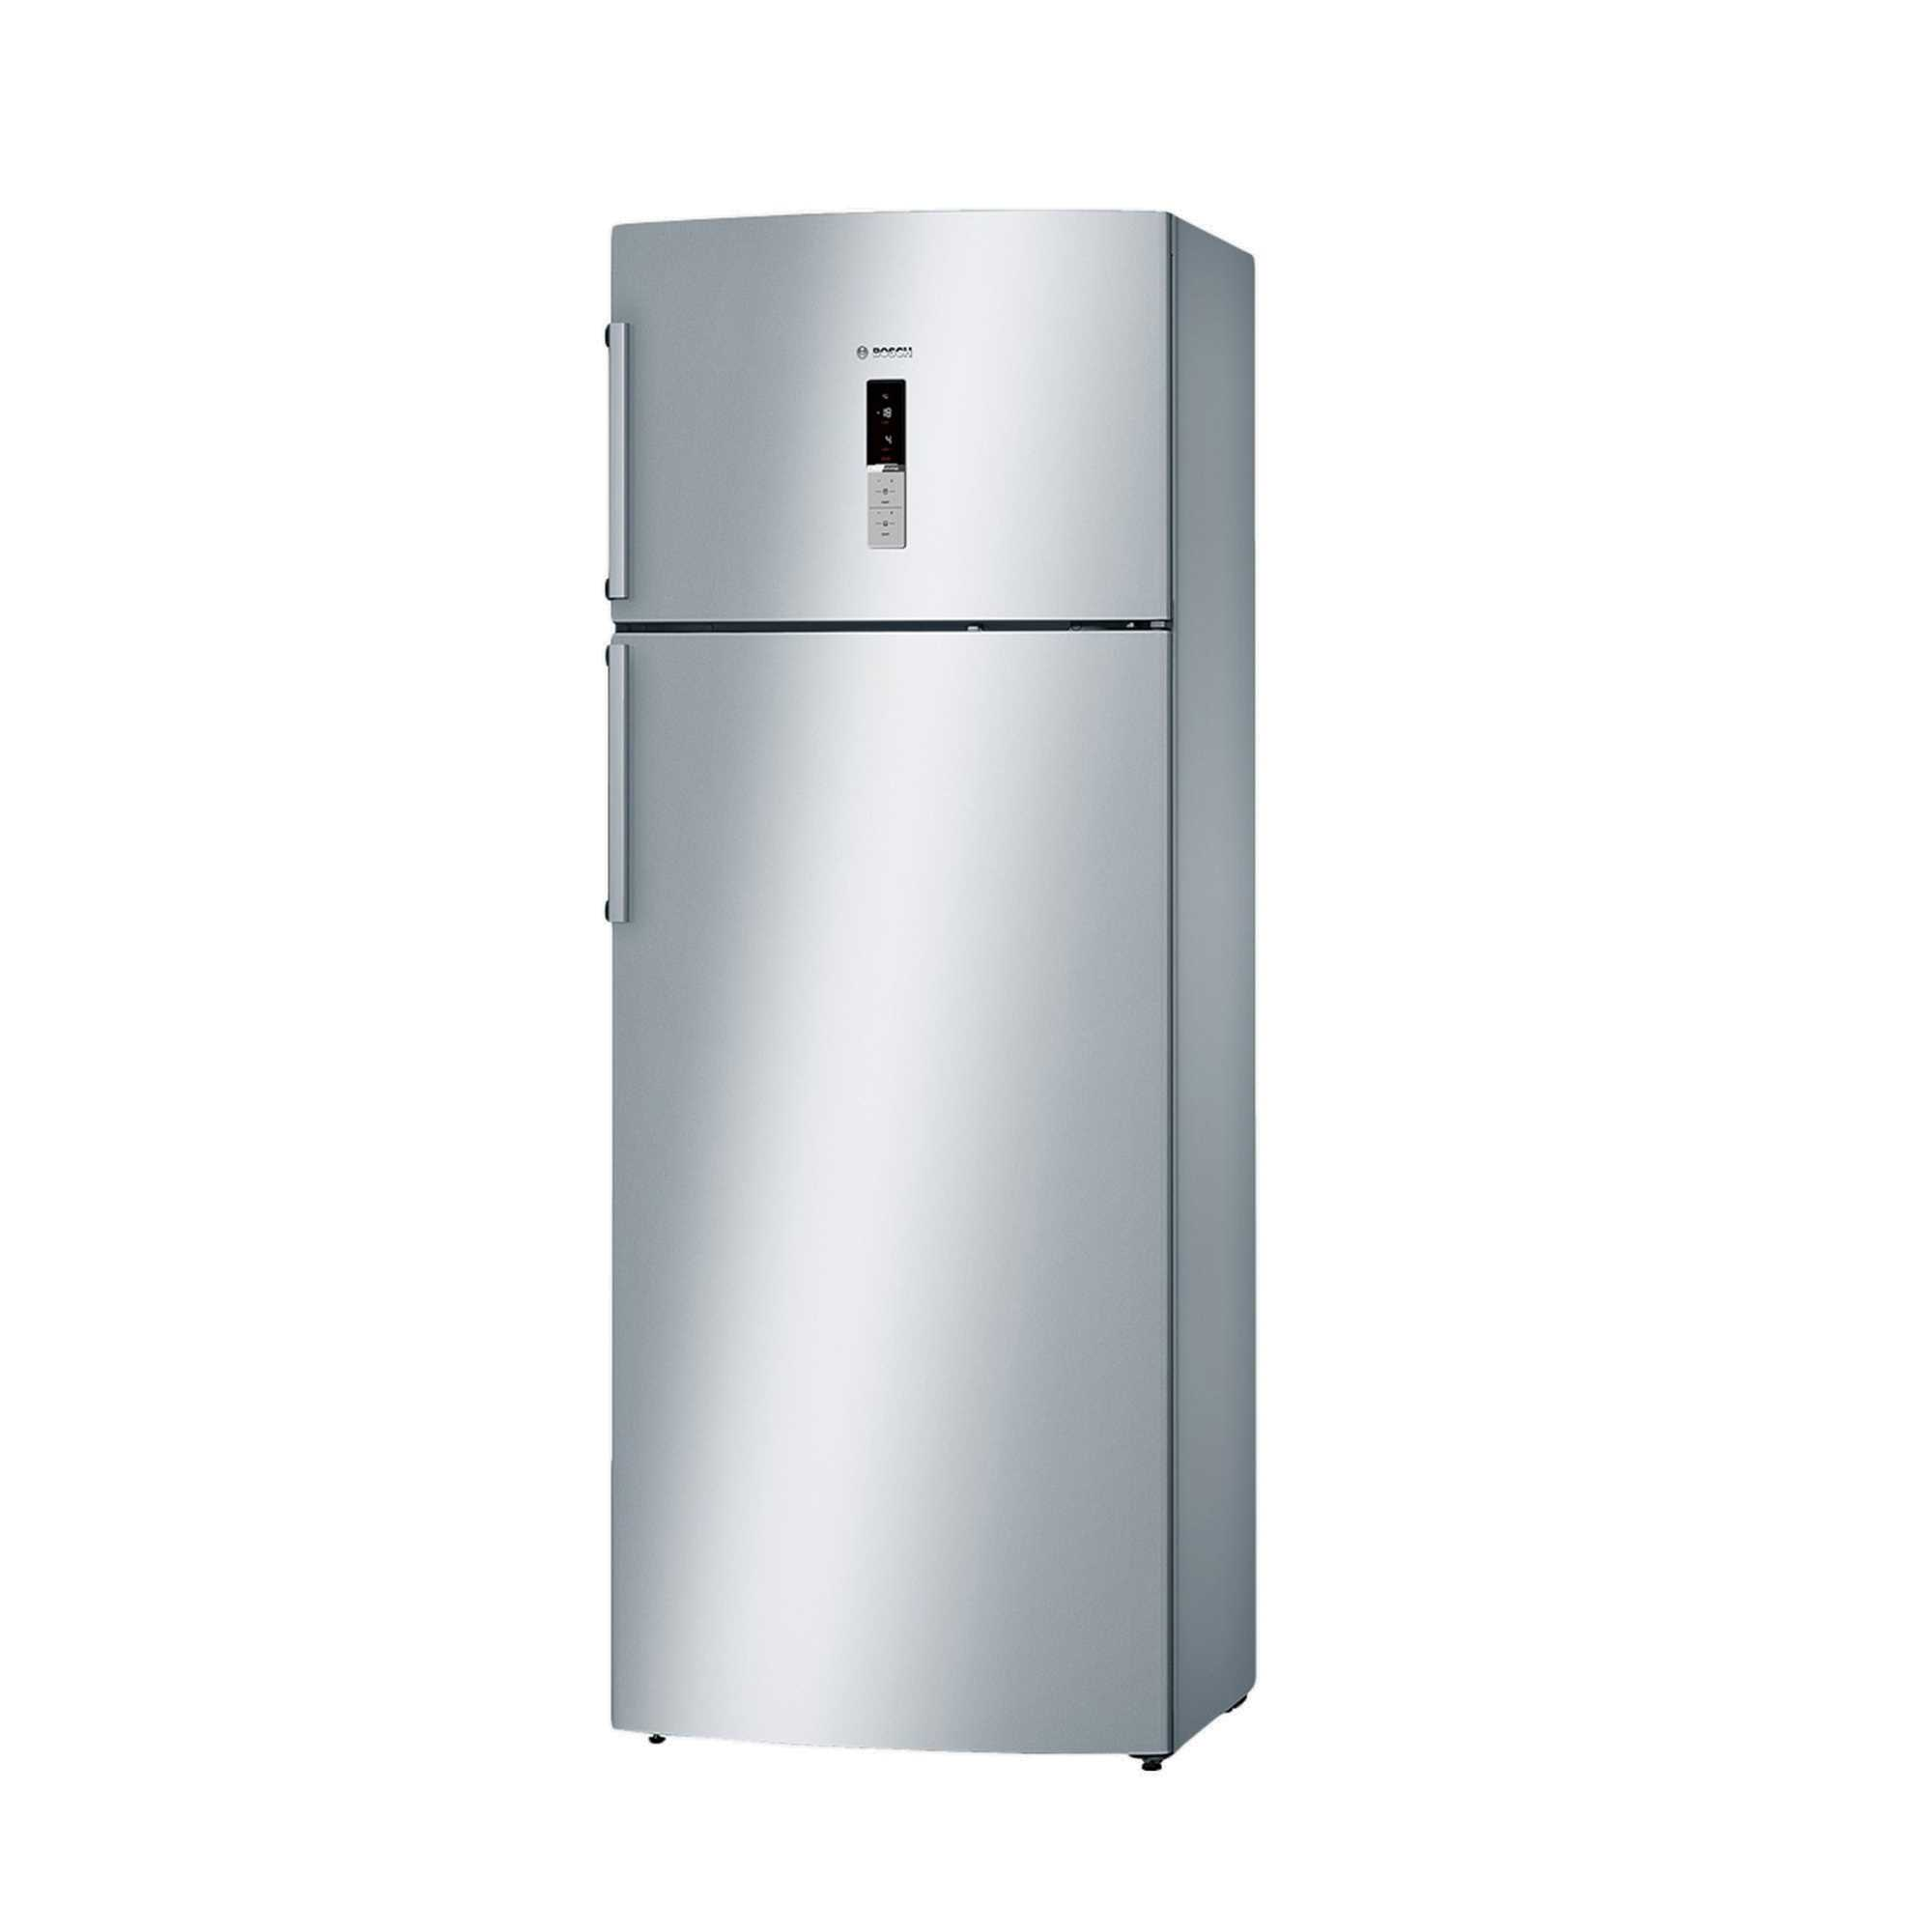 Bosch KDN46XI30I 401 Litres Double Door Direct Cool Refrigerator